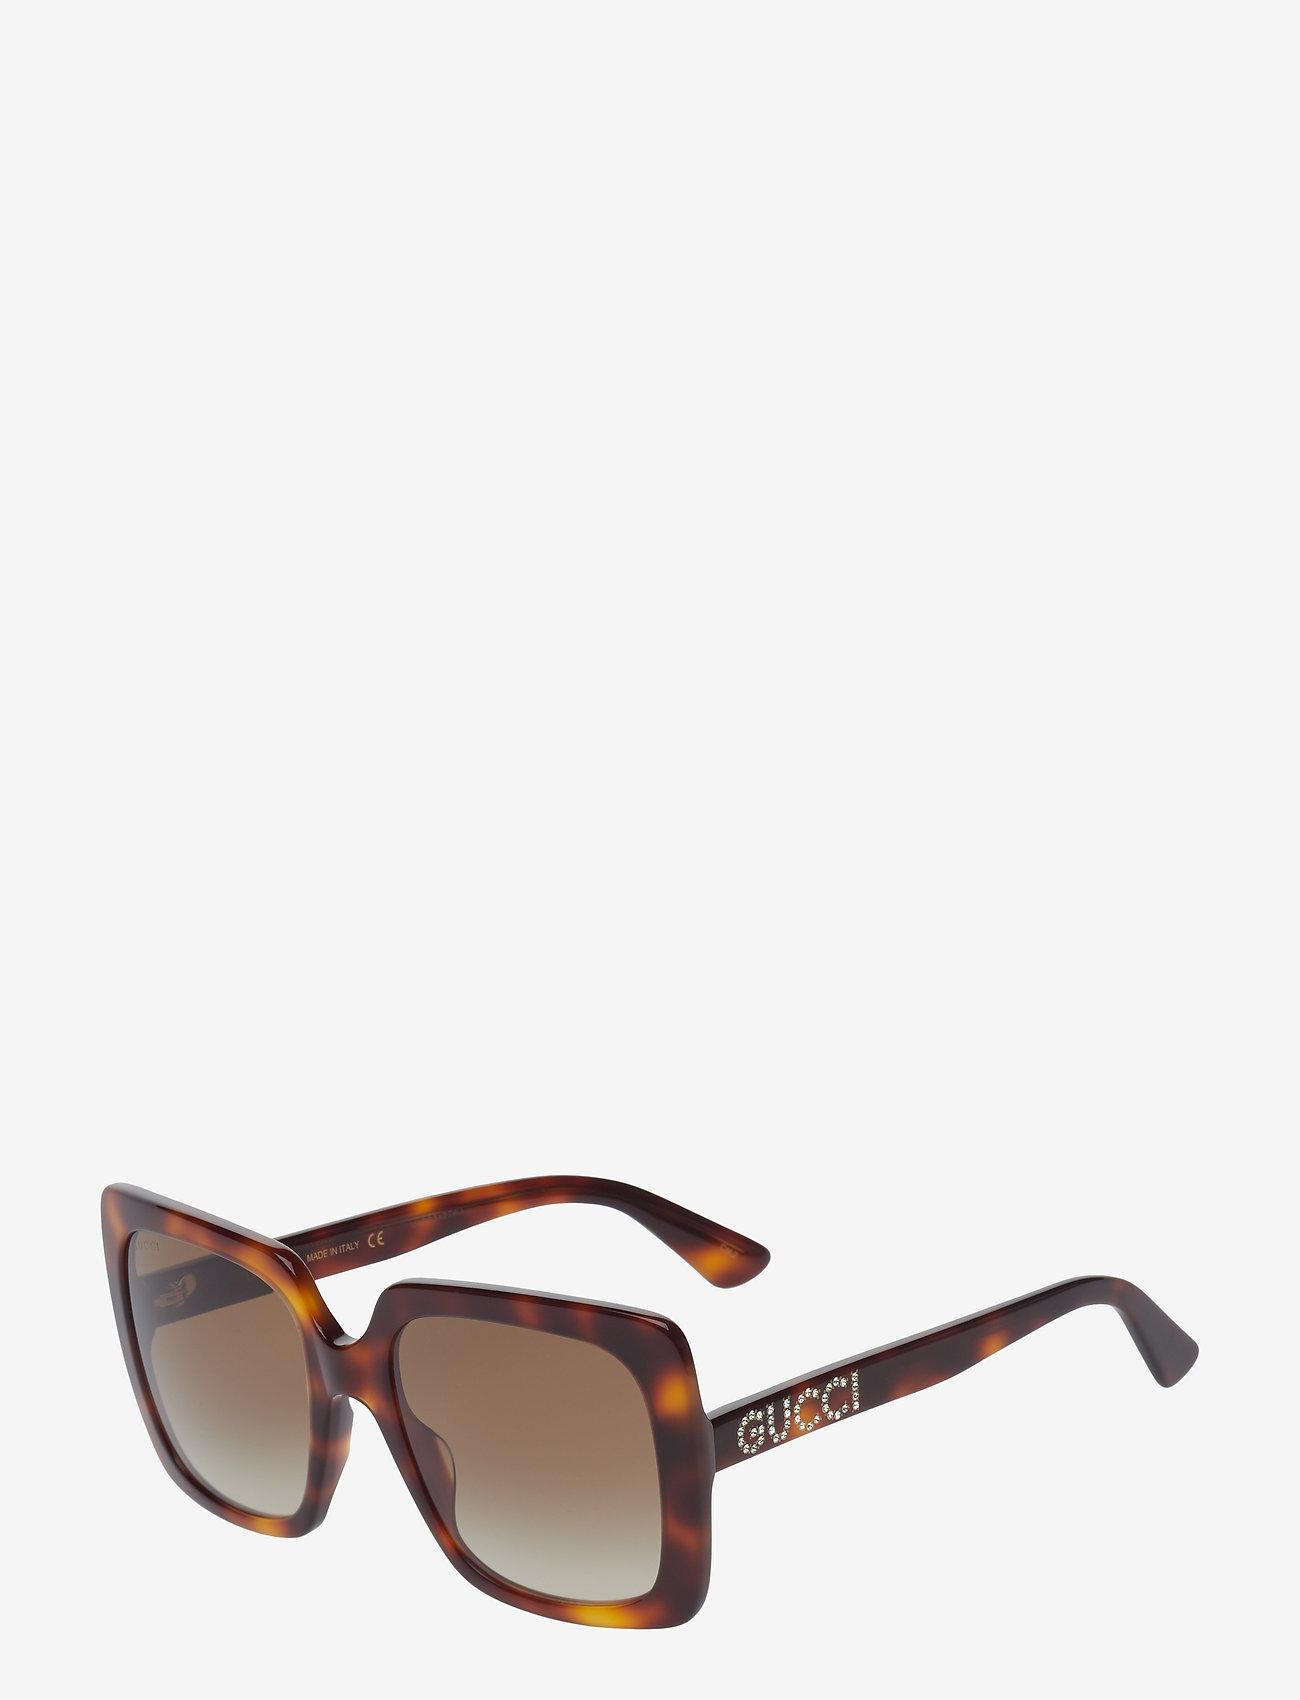 Gucci Sunglasses - GG0418S - neliökehys - havana-havana-brown - 1